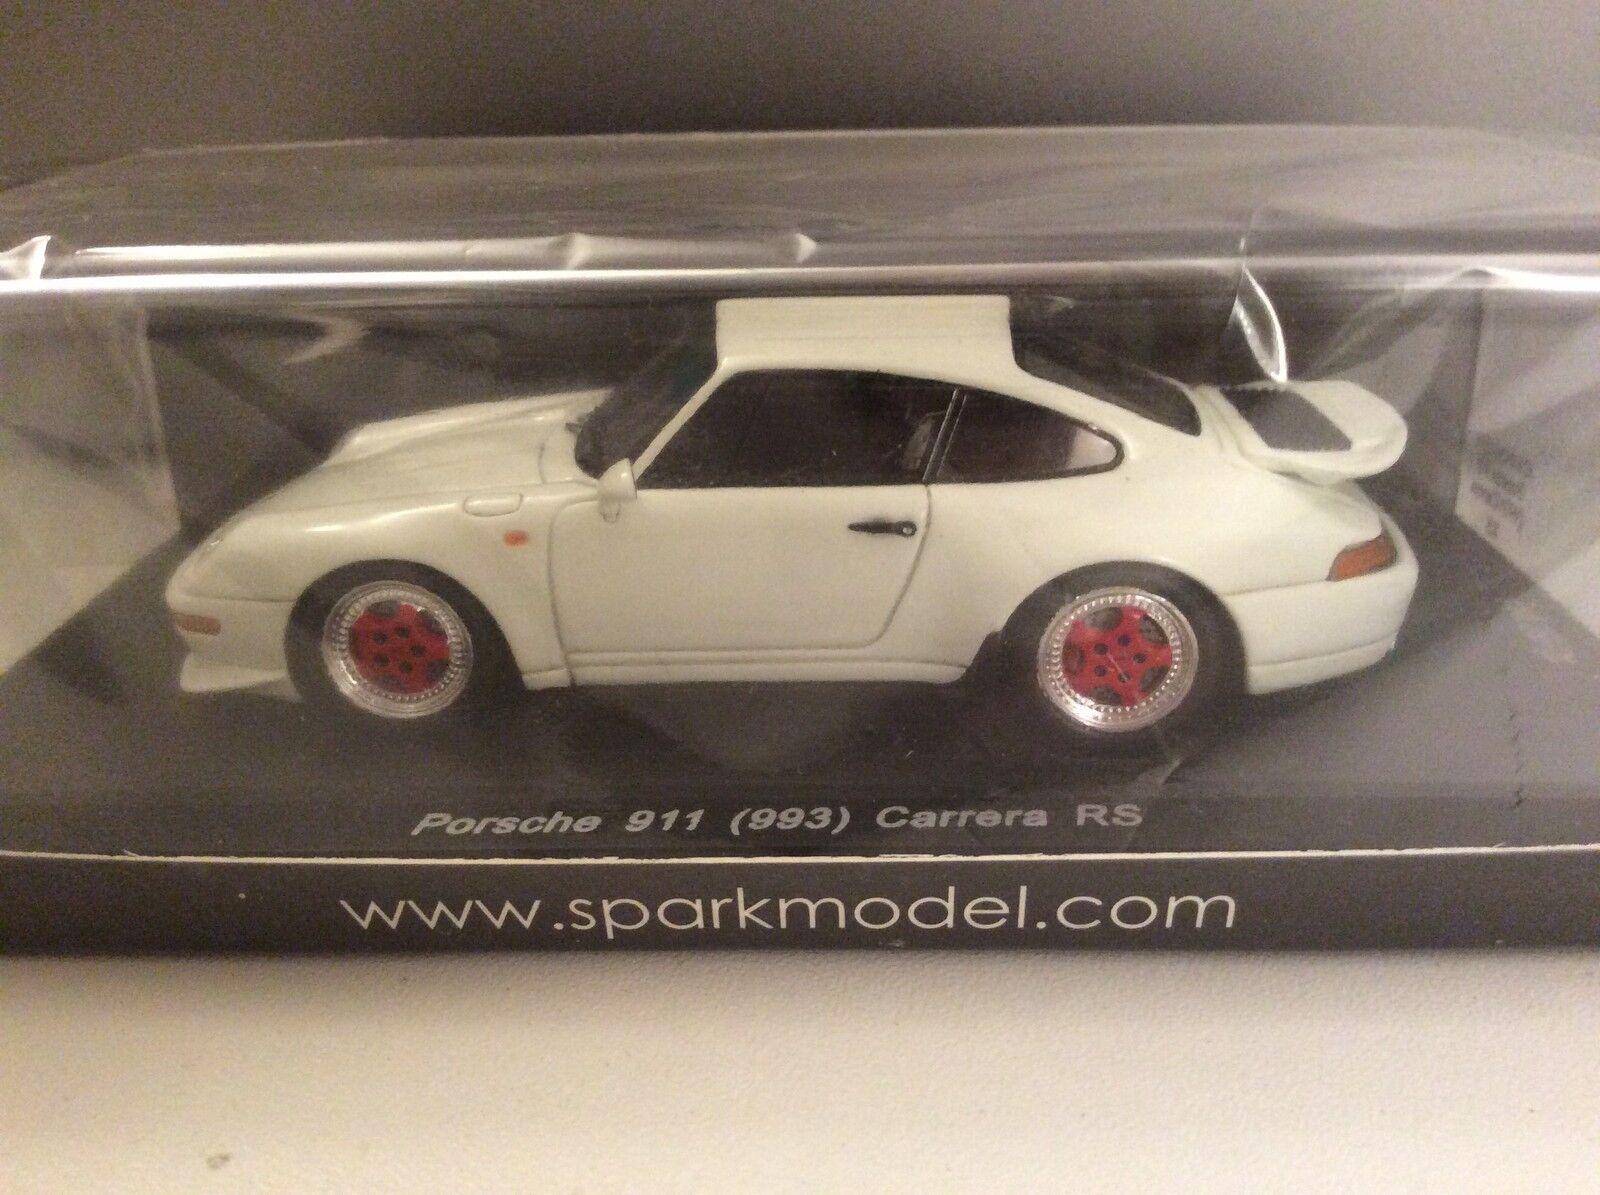 SPARK 1/43 PORSCHE 911 993 Carrera RS BIANCO cartima Giappone Exclusive 50 Pezzi OVP